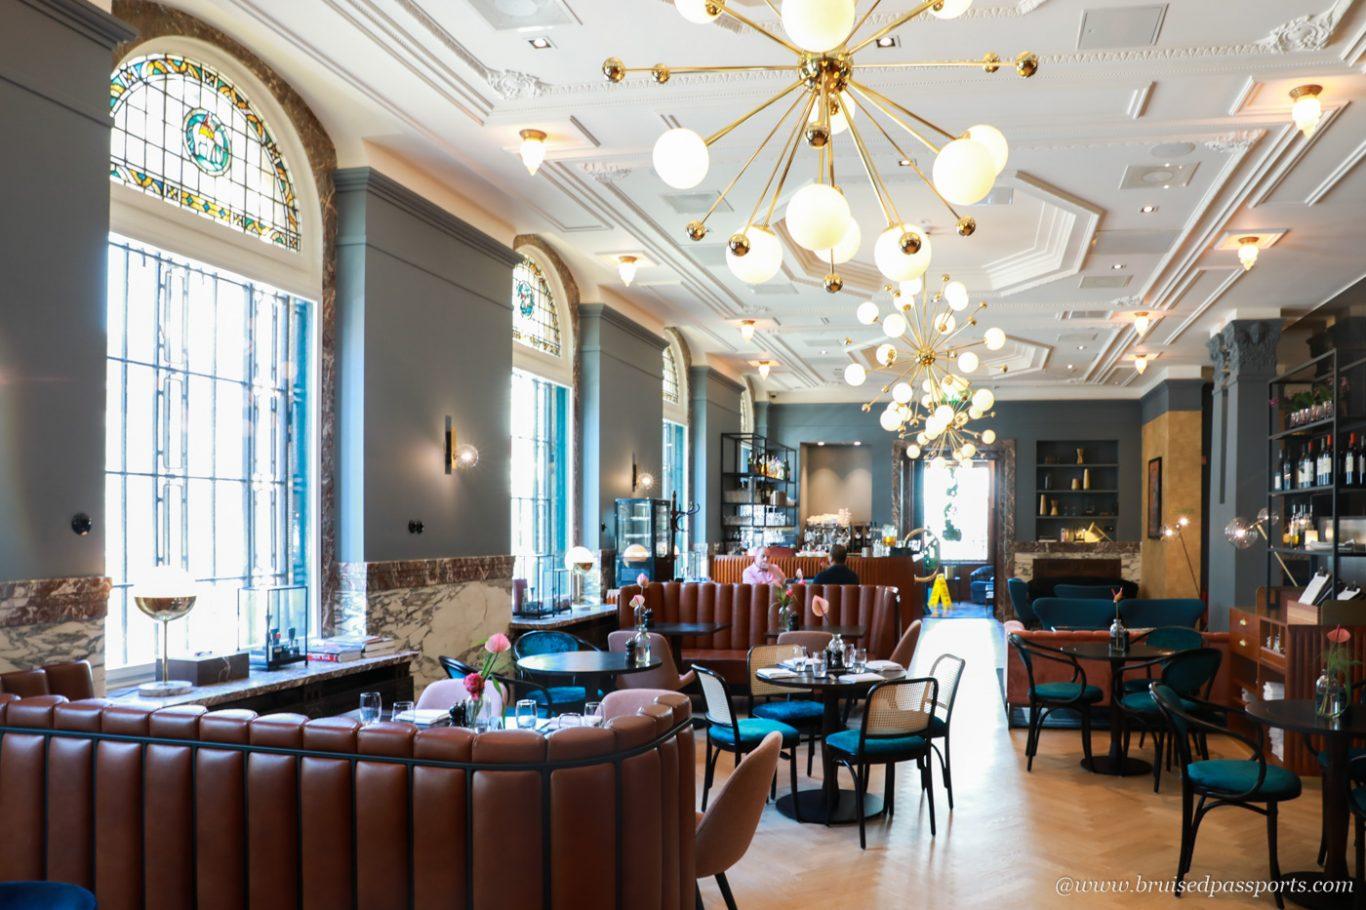 Dining area at Hotel Indigo The Hague